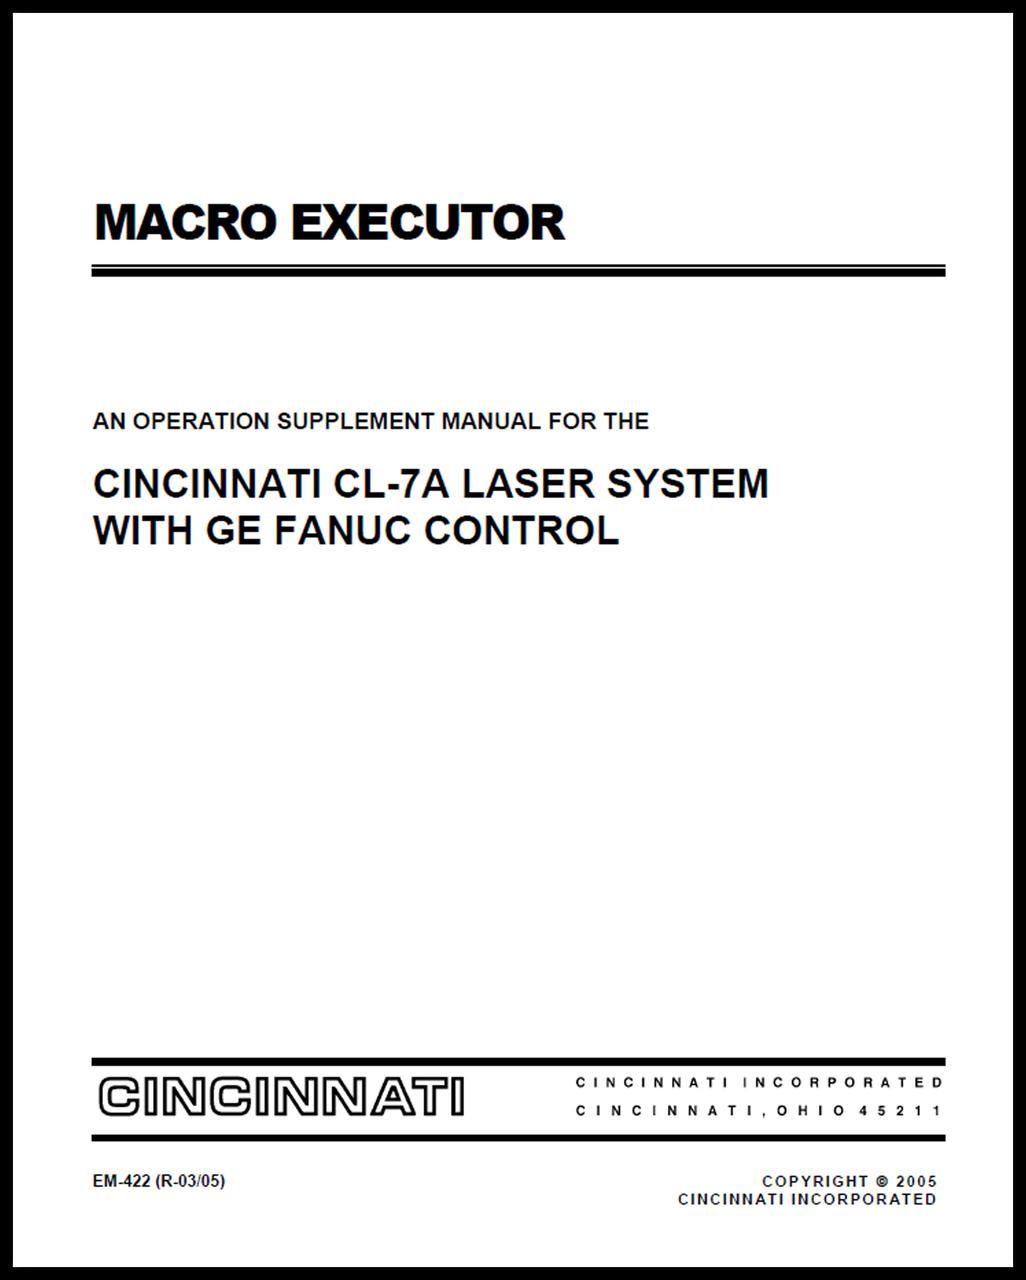 macro executor an operation supplement manual for the cincinnati rh ci online e ci com Fanuc Programming Training Fanuc Karel Programming